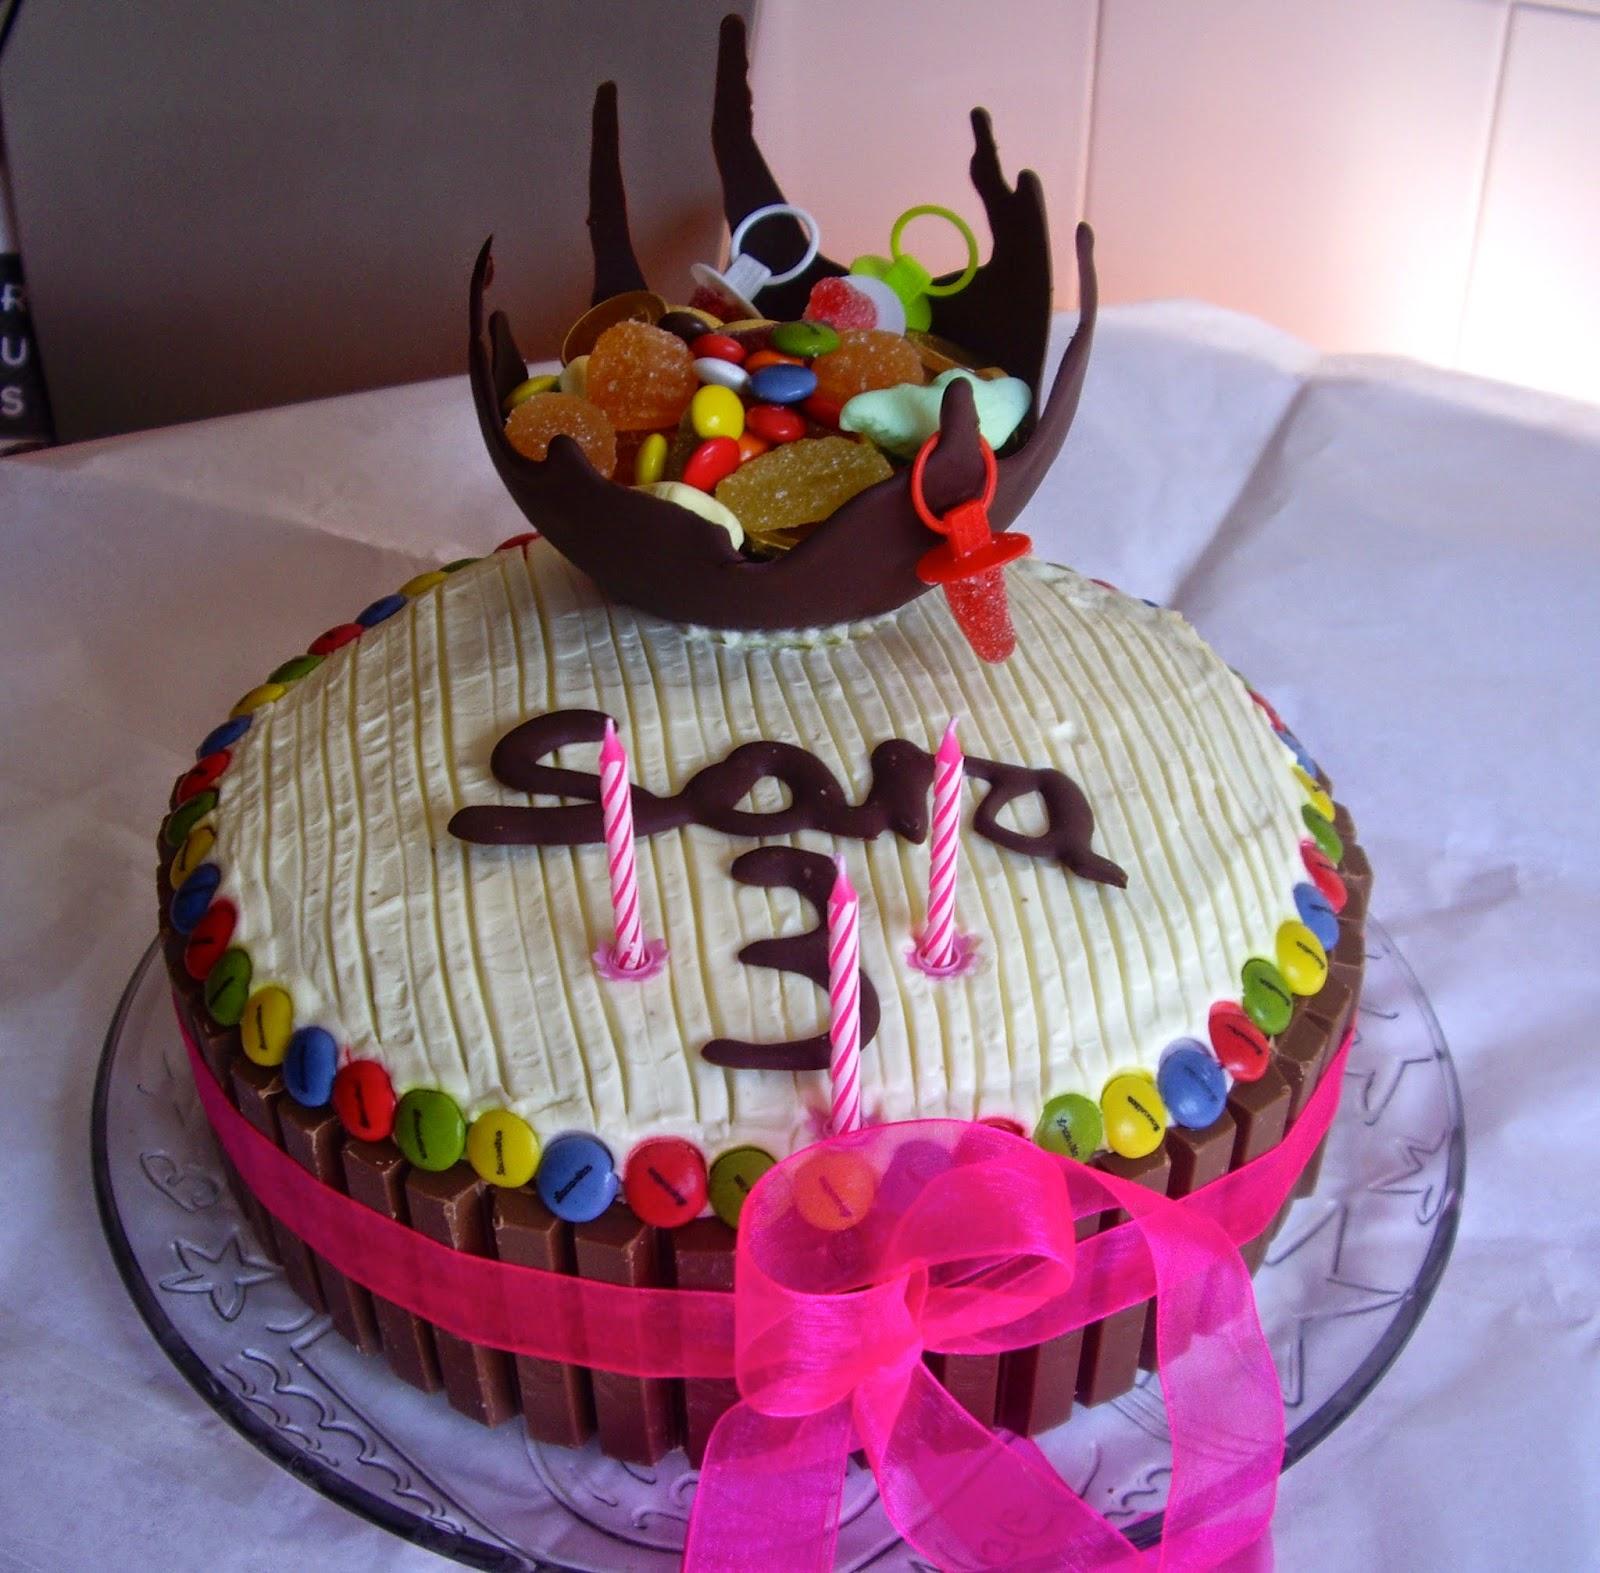 Harinaygasolina CARROT CAKE PASTEL DE ZANAHORIA TRANSFORMACION